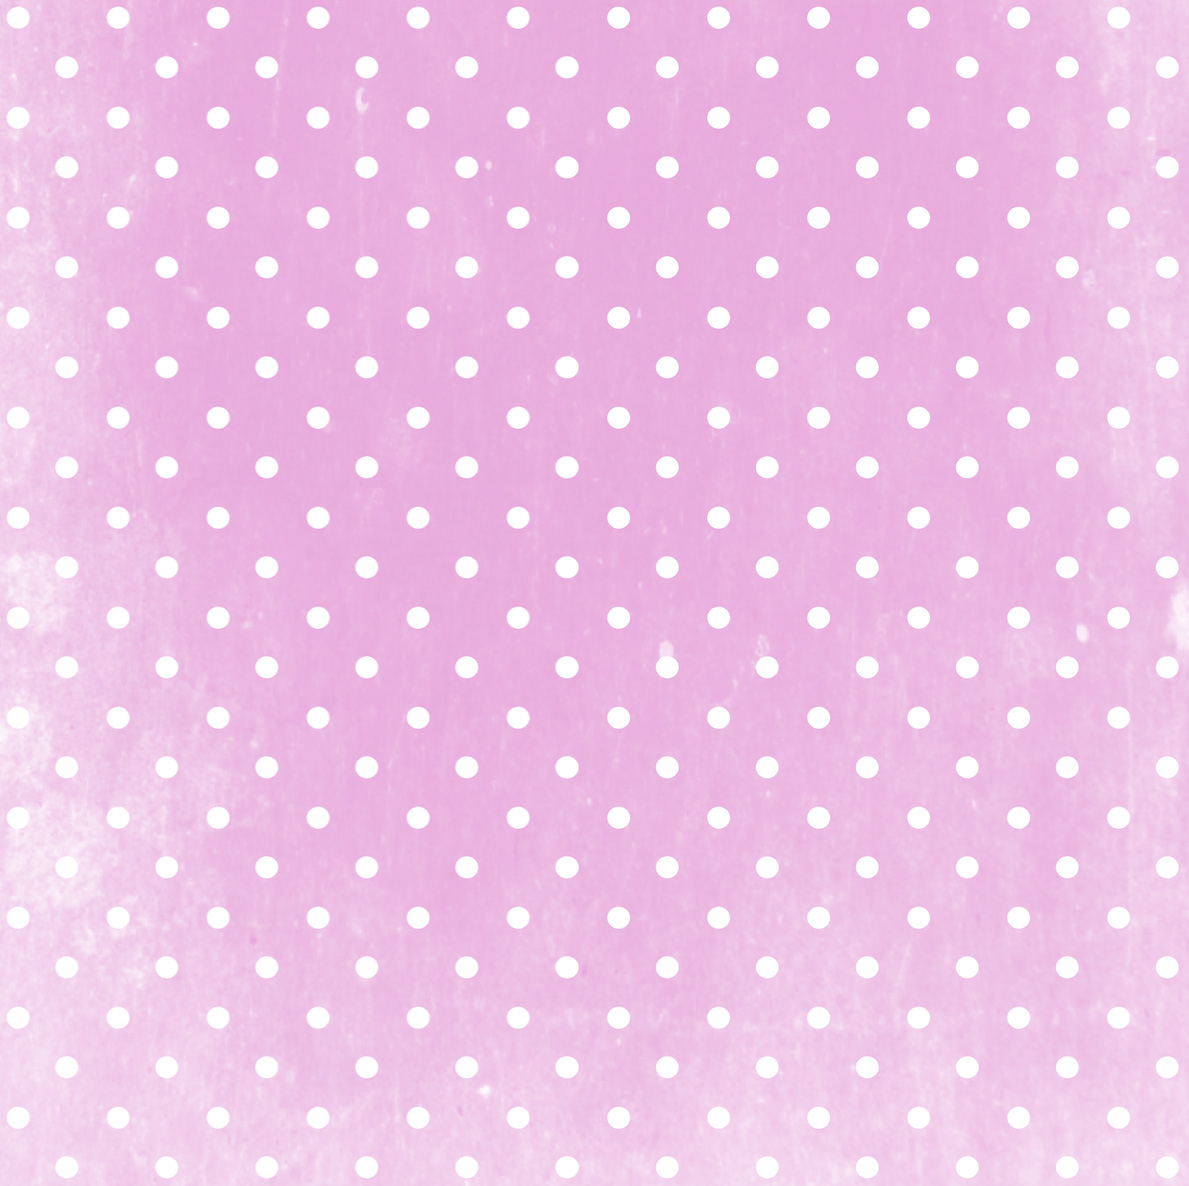 Free Digital Vintage Polka Dot Scrapbooking And Fun Paper No2 - Free Printable Pink Polka Dot Paper